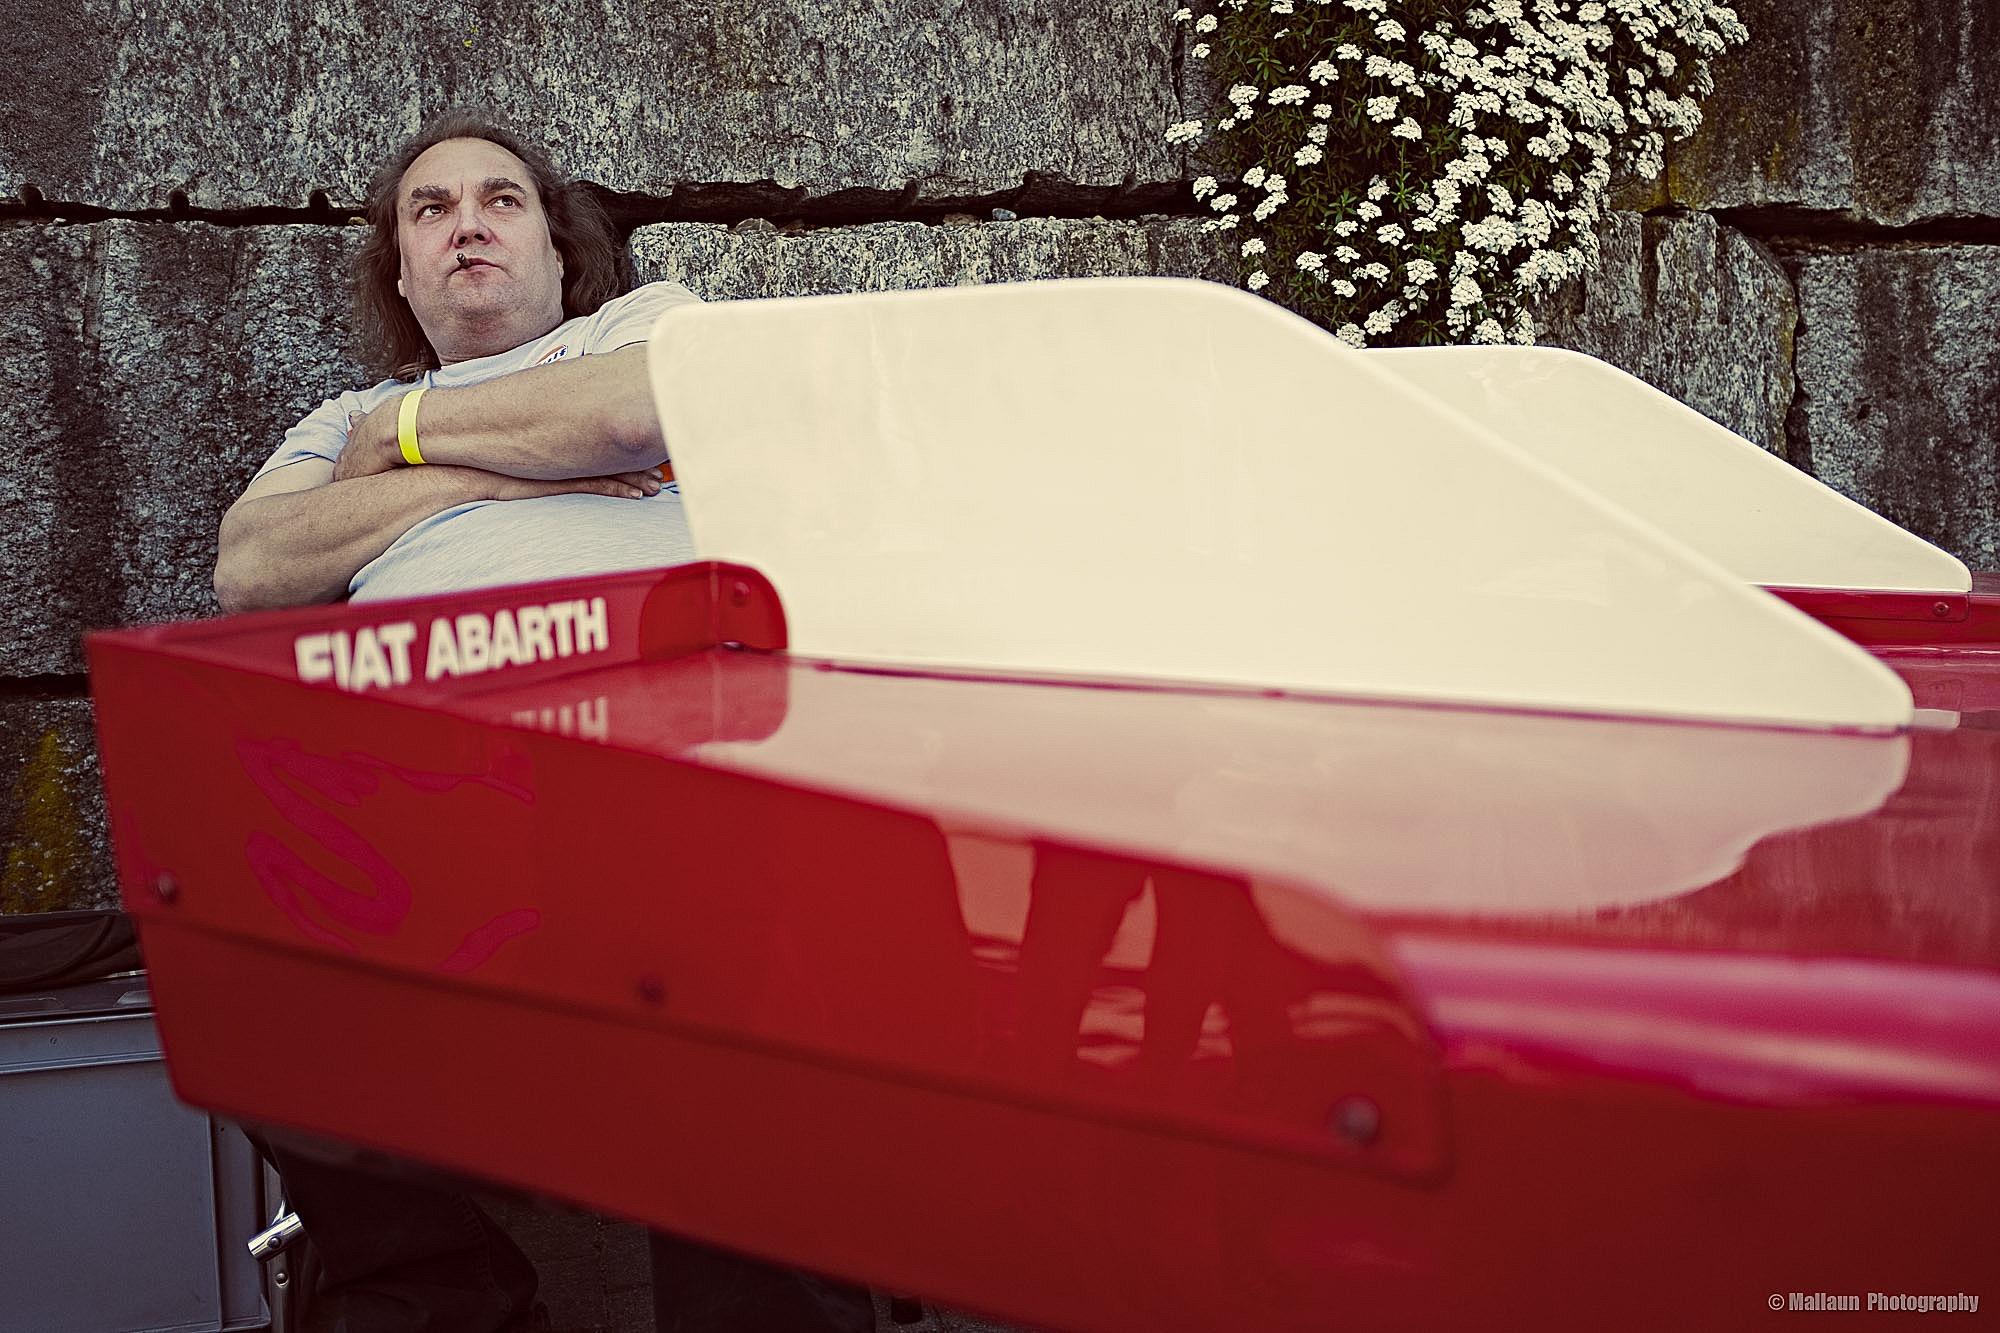 Fiat Abarth Proto SE 021, 1971 © Mallaun Photography